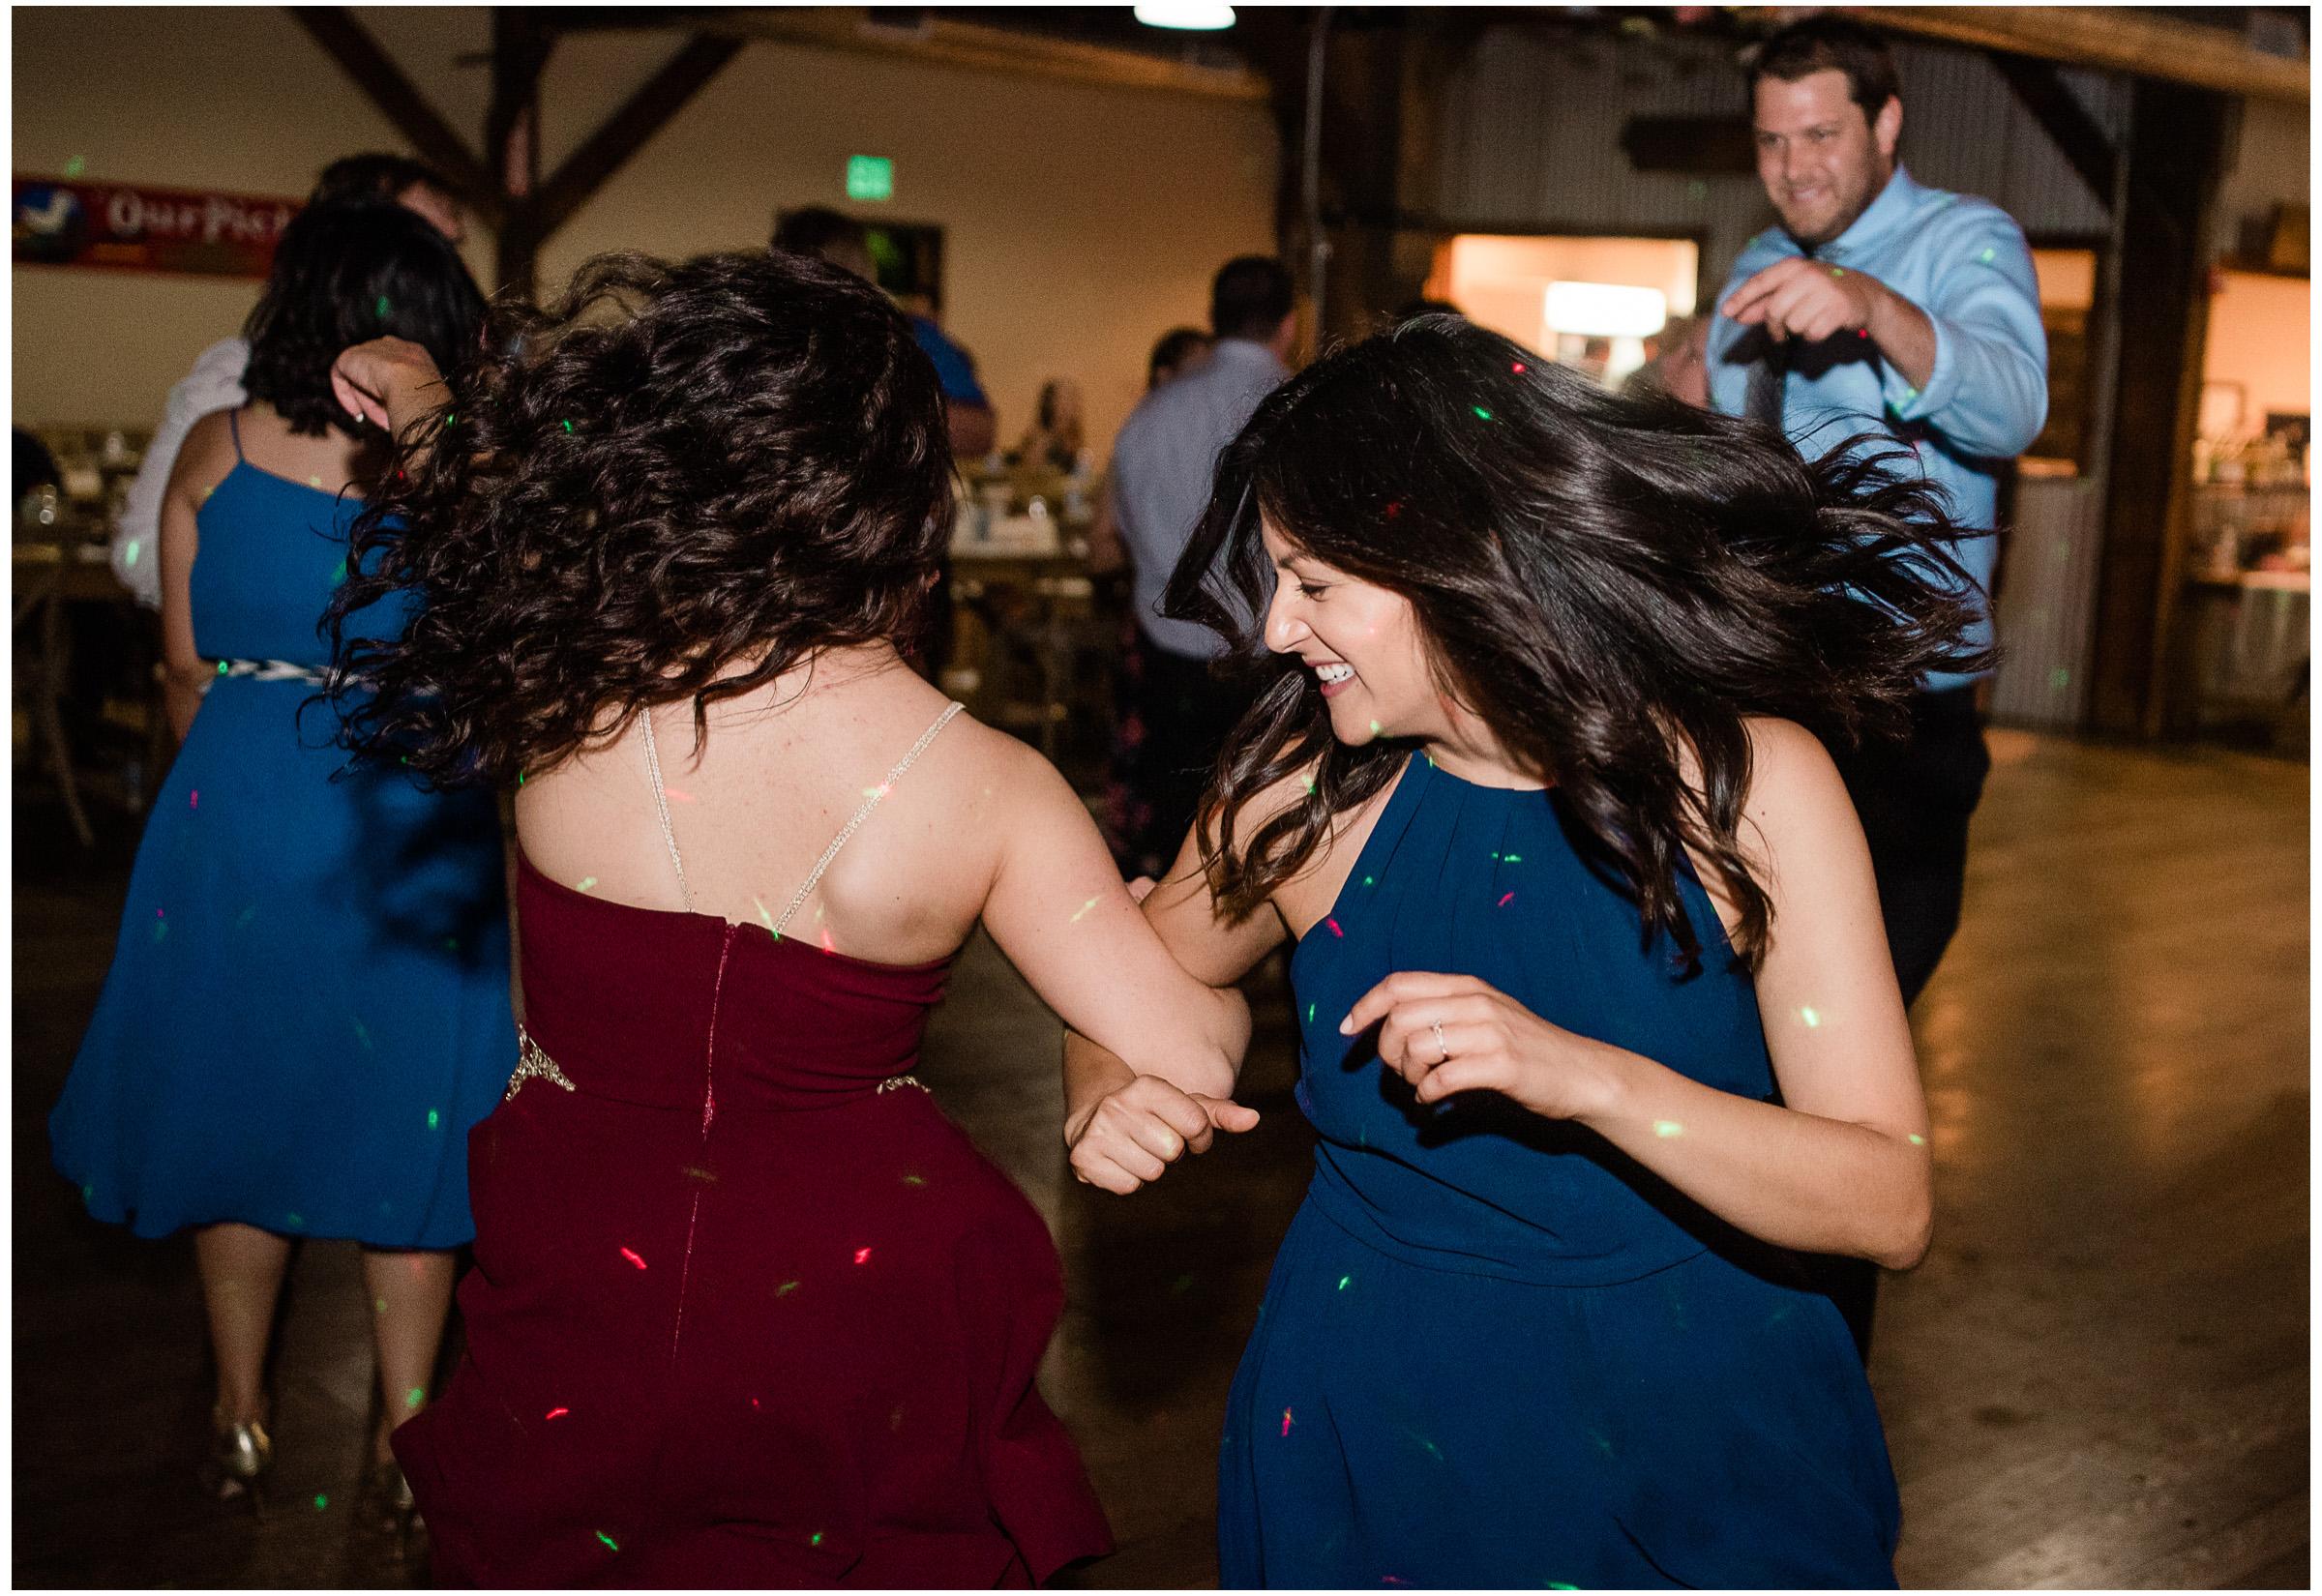 Loomis Wedding - Sacramento Photographer - Blue Goose - Justin Wilcox Photography - 27.jpg